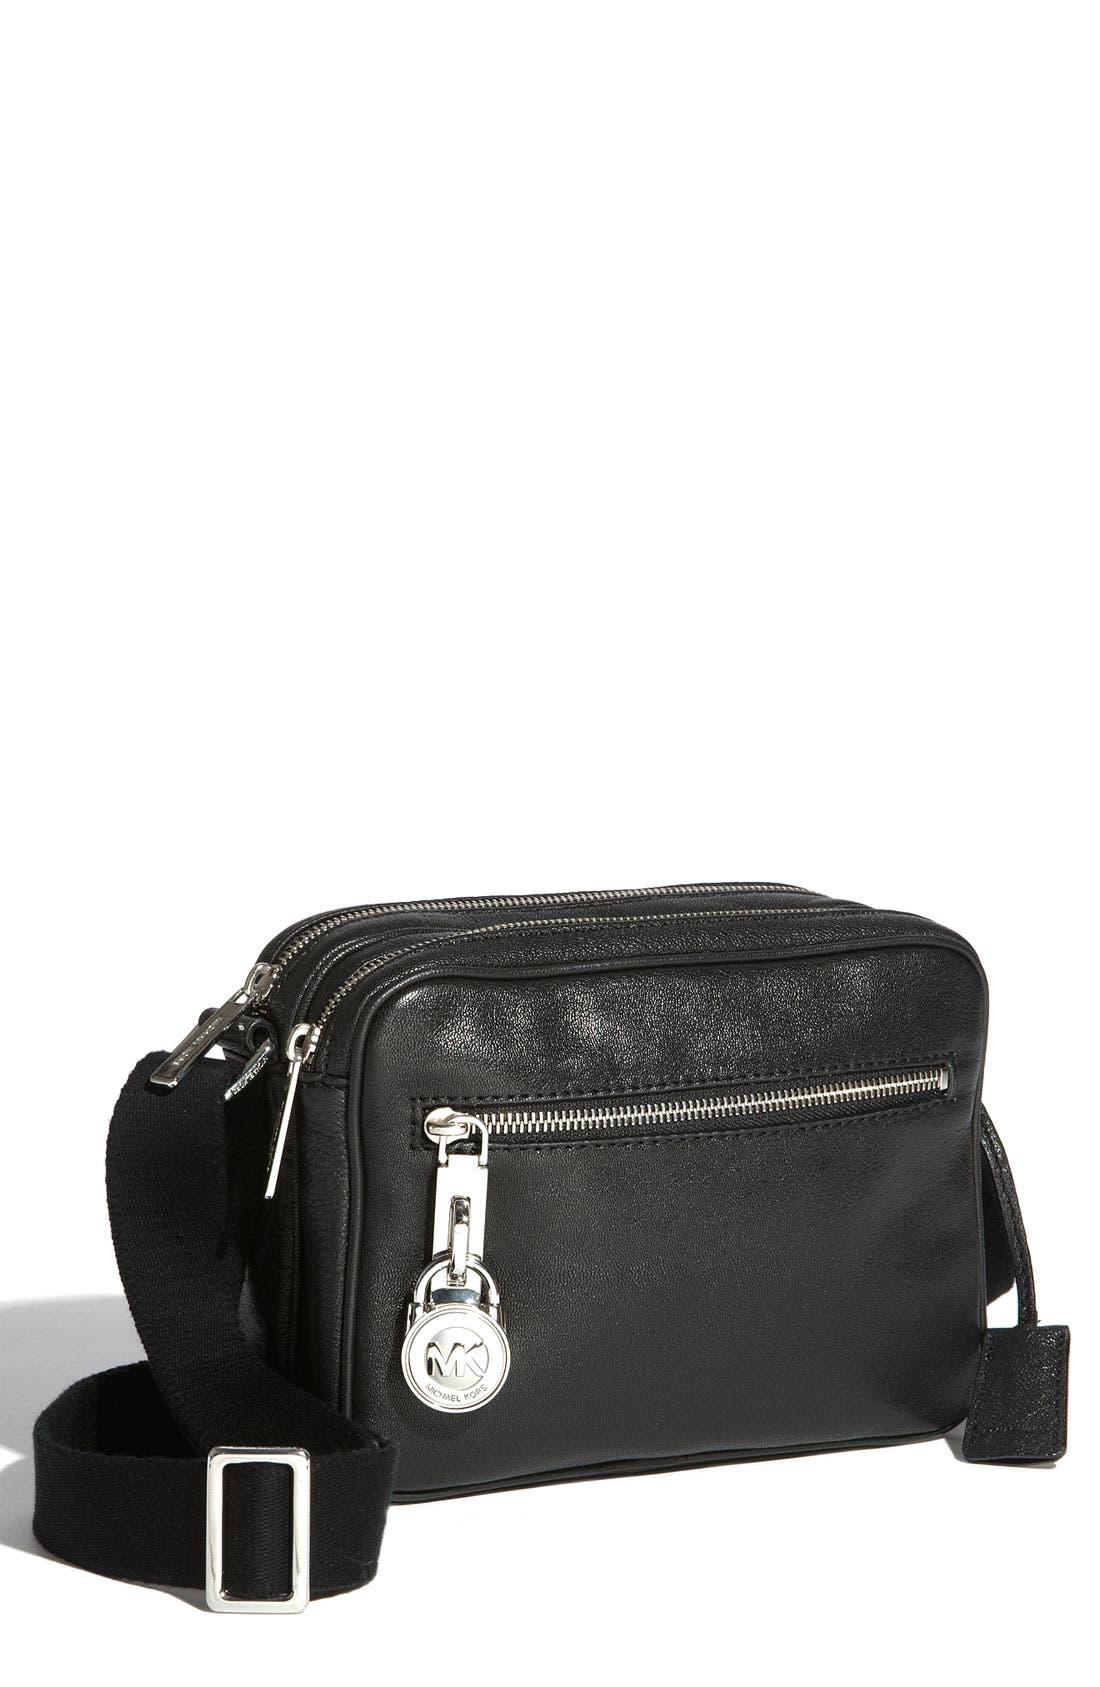 Alternate Image 1 Selected - MICHAEL Michael Kors 'Flight' Crossbody Bag